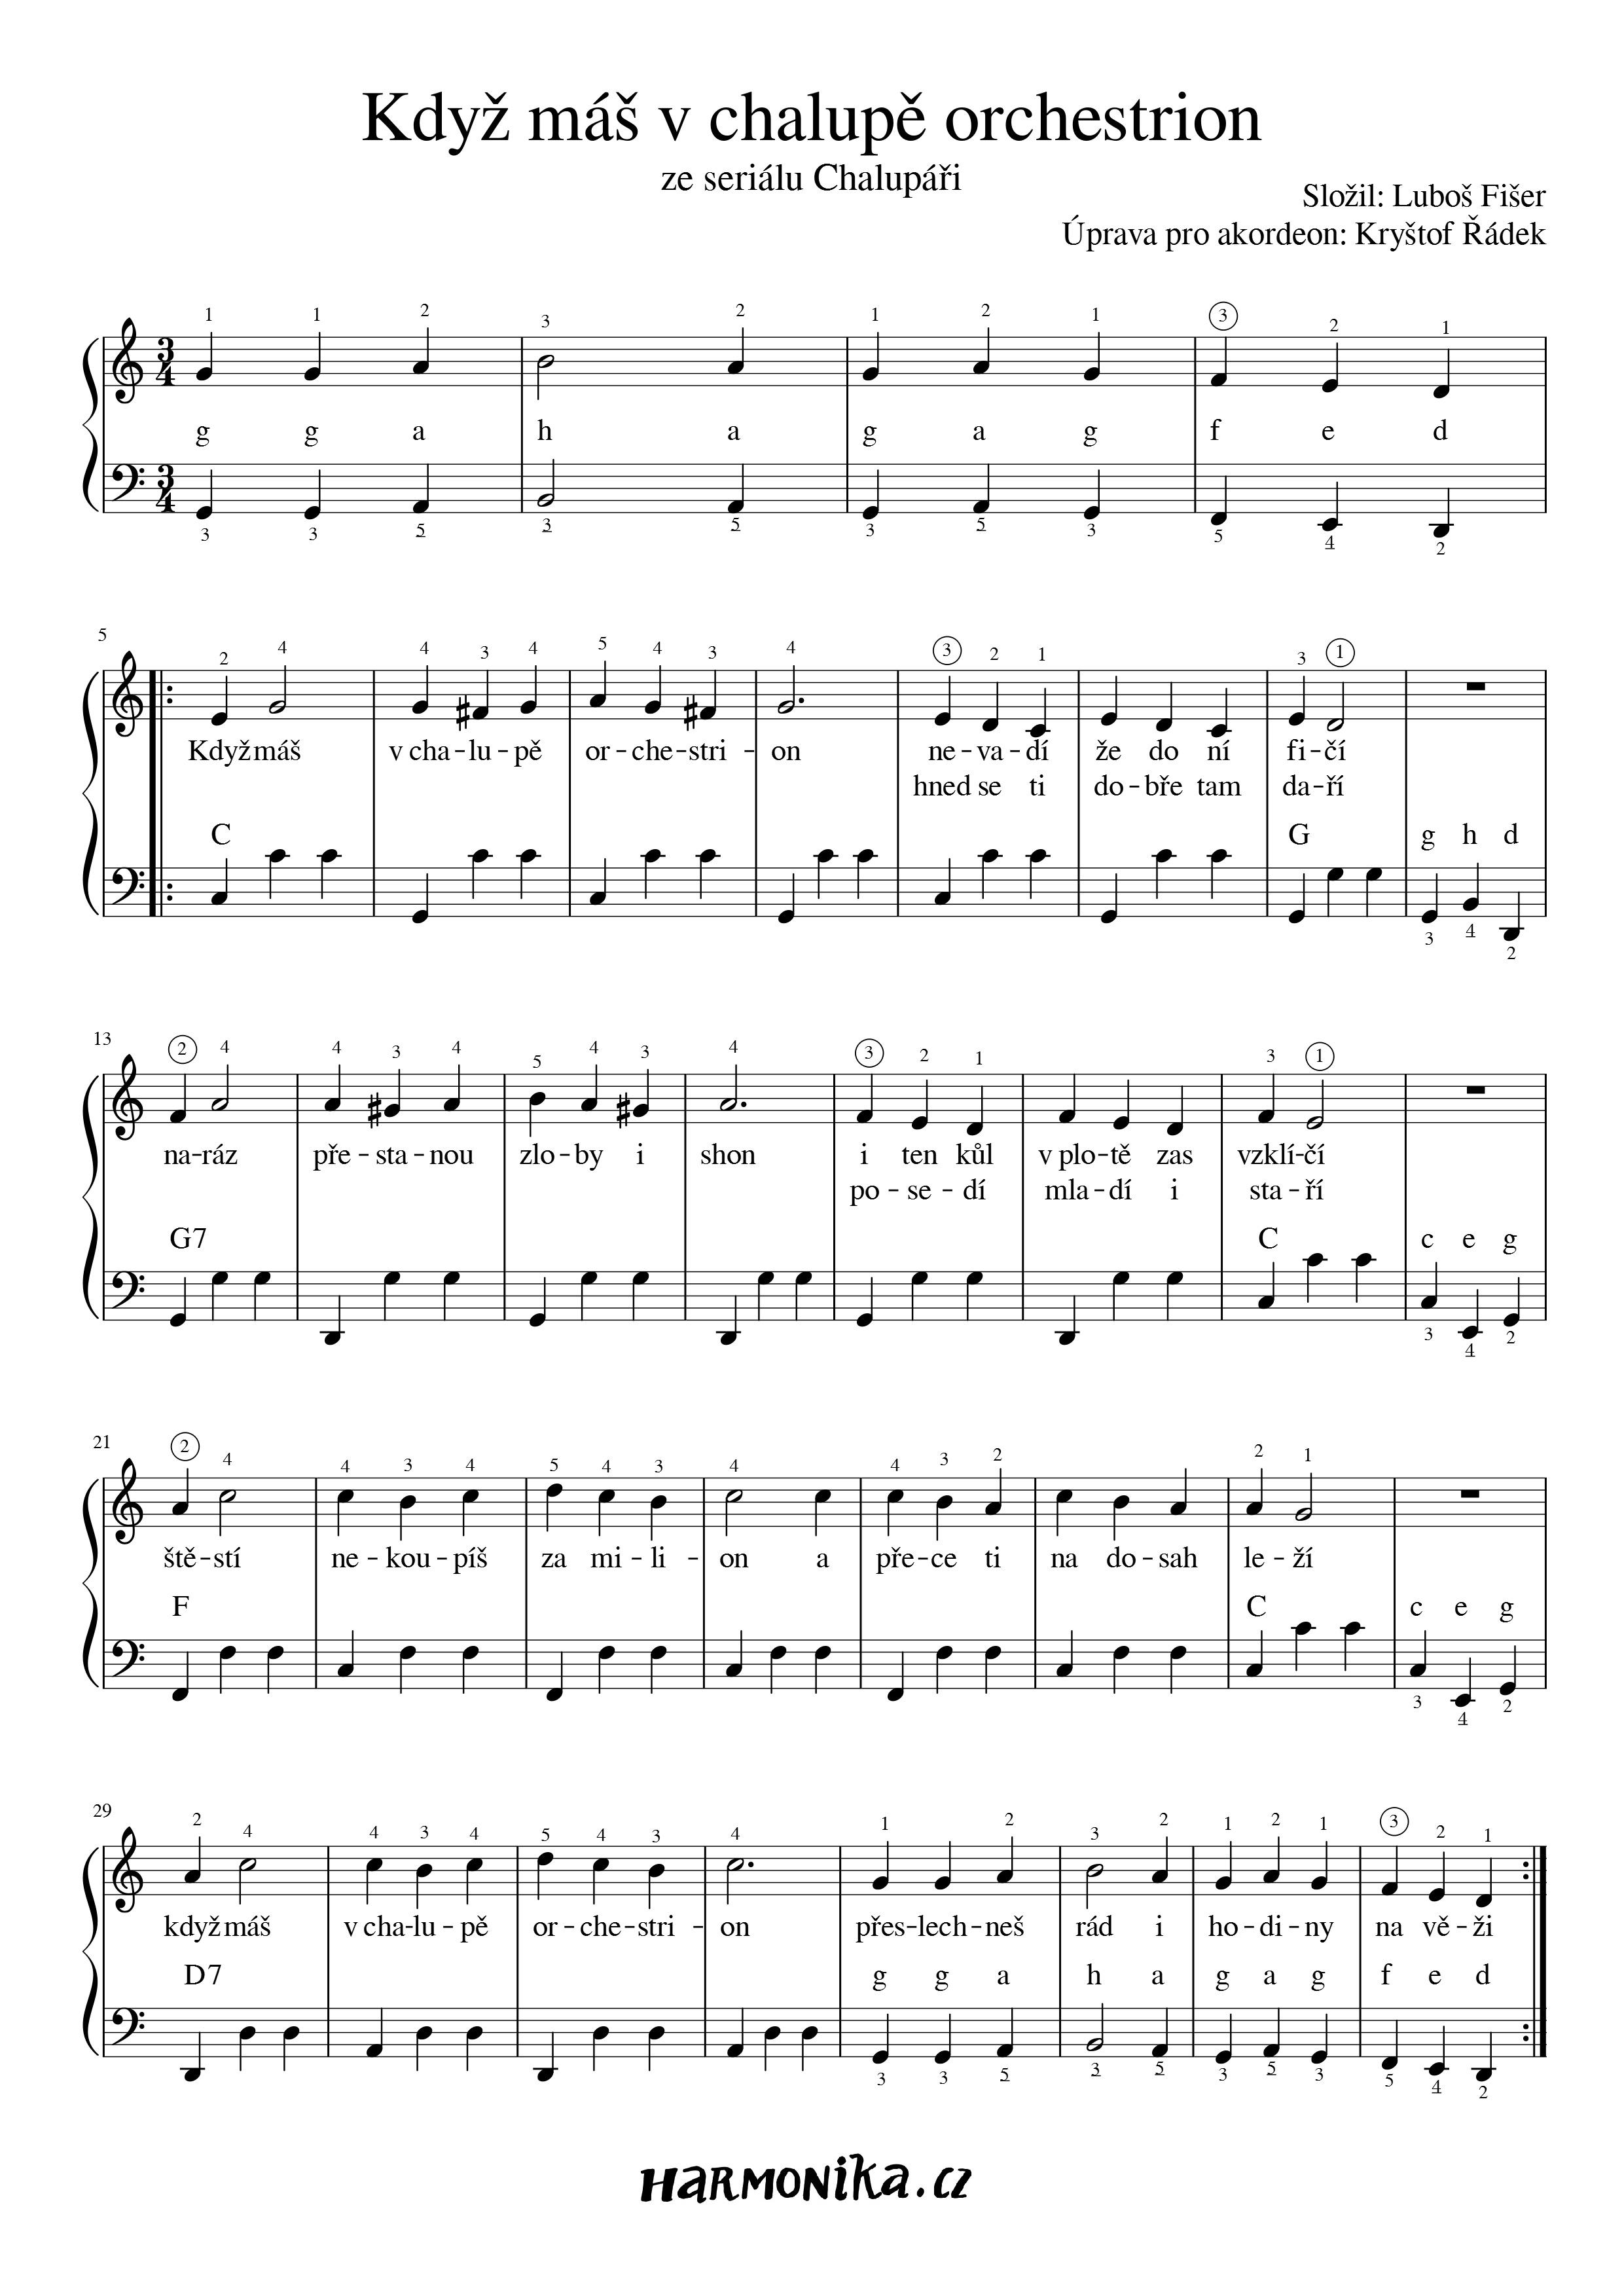 kdyz-mas-v-chalupe-orchestrion-1